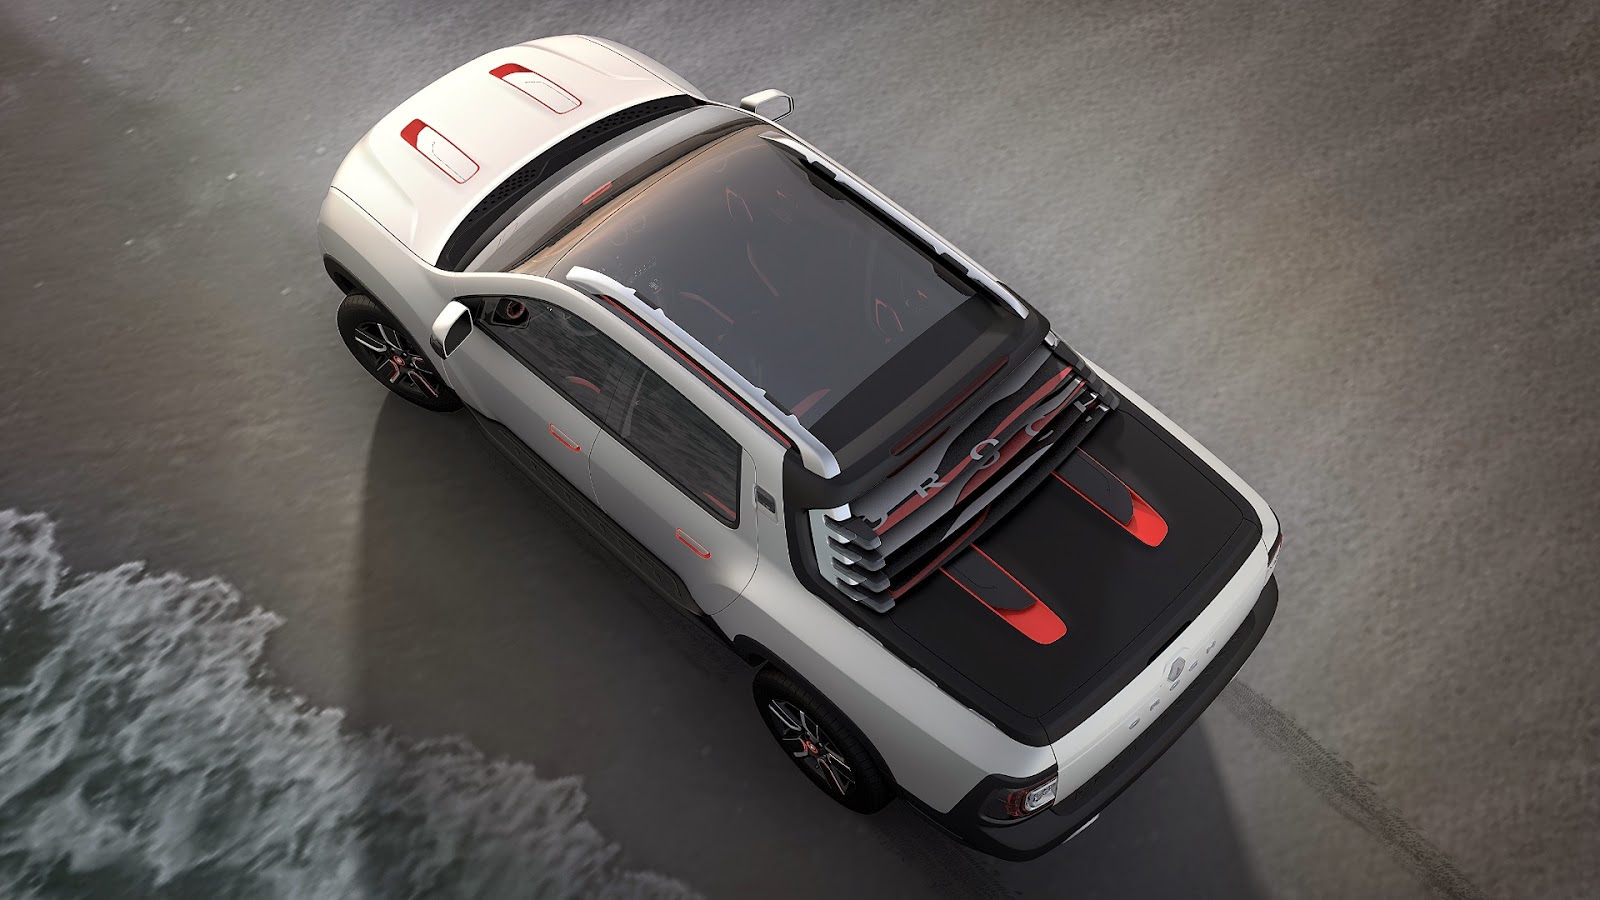 Nissan Navara New Challenger Appears!